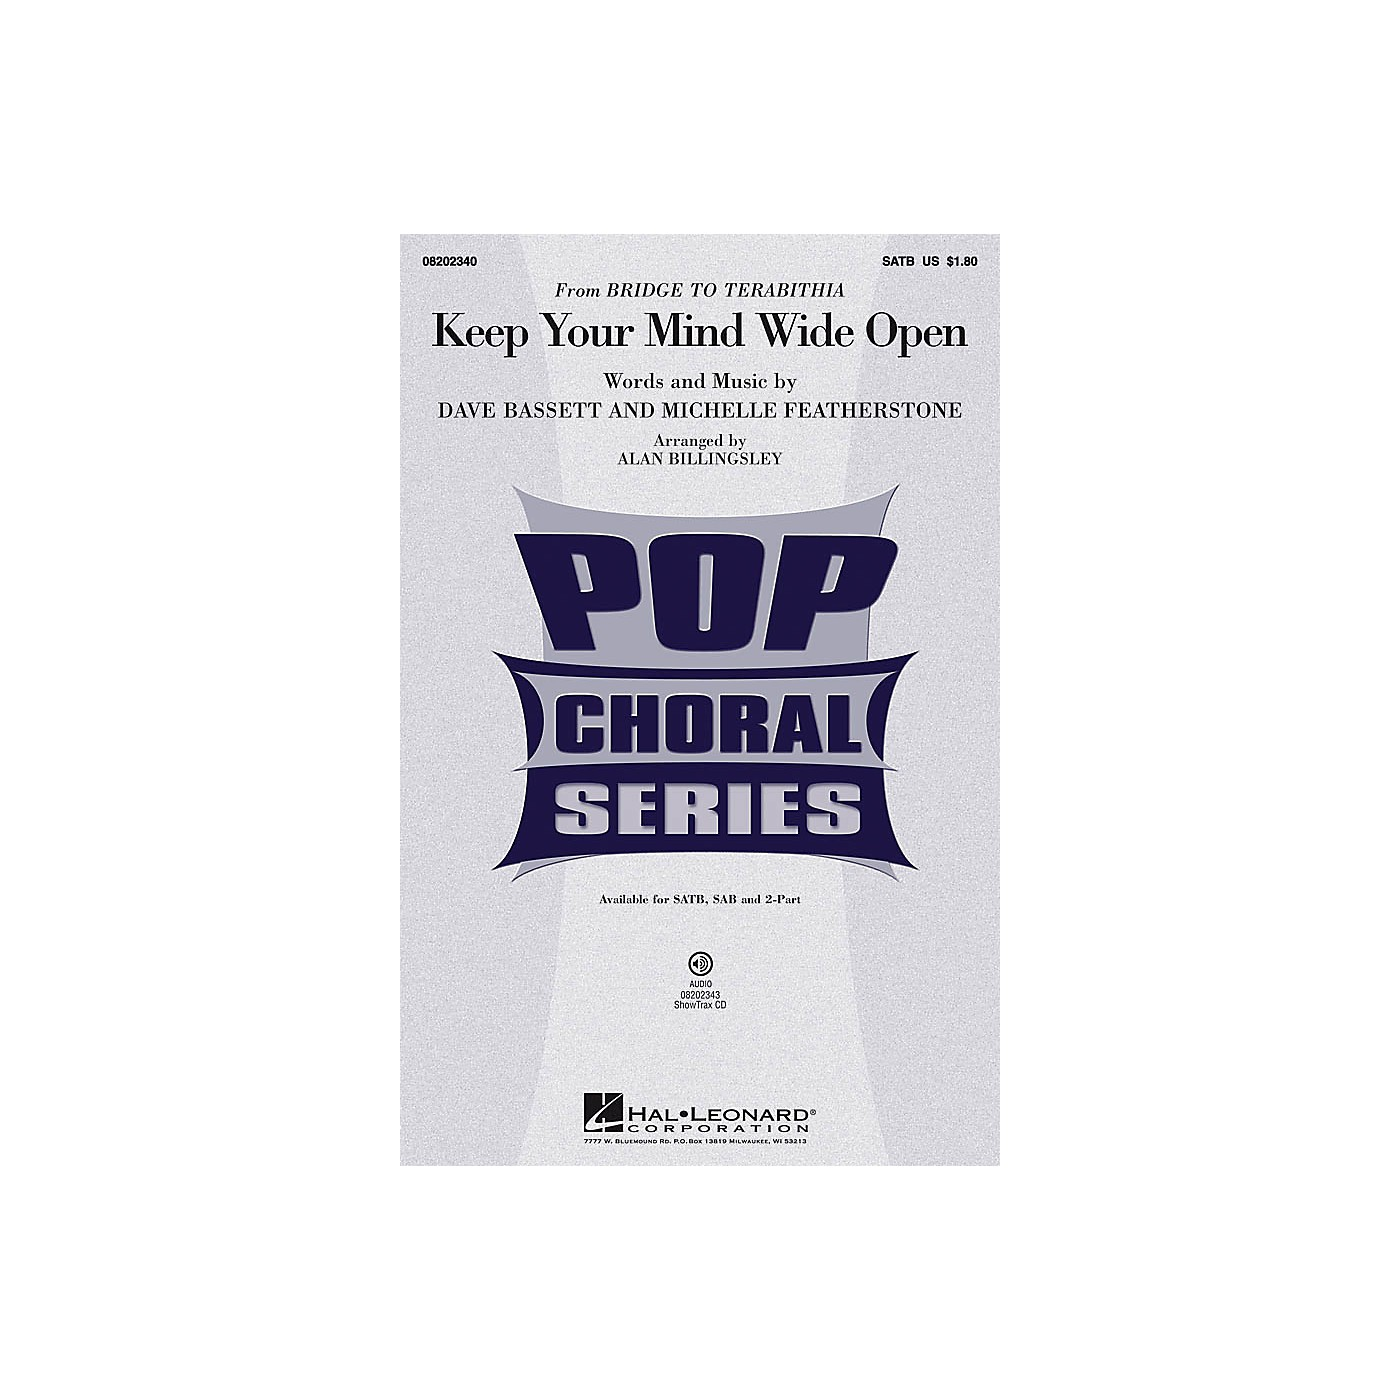 Hal Leonard Keep Your Mind Wide Open ShowTrax CD by AnnaSophia Robb Arranged by Alan Billingsley thumbnail